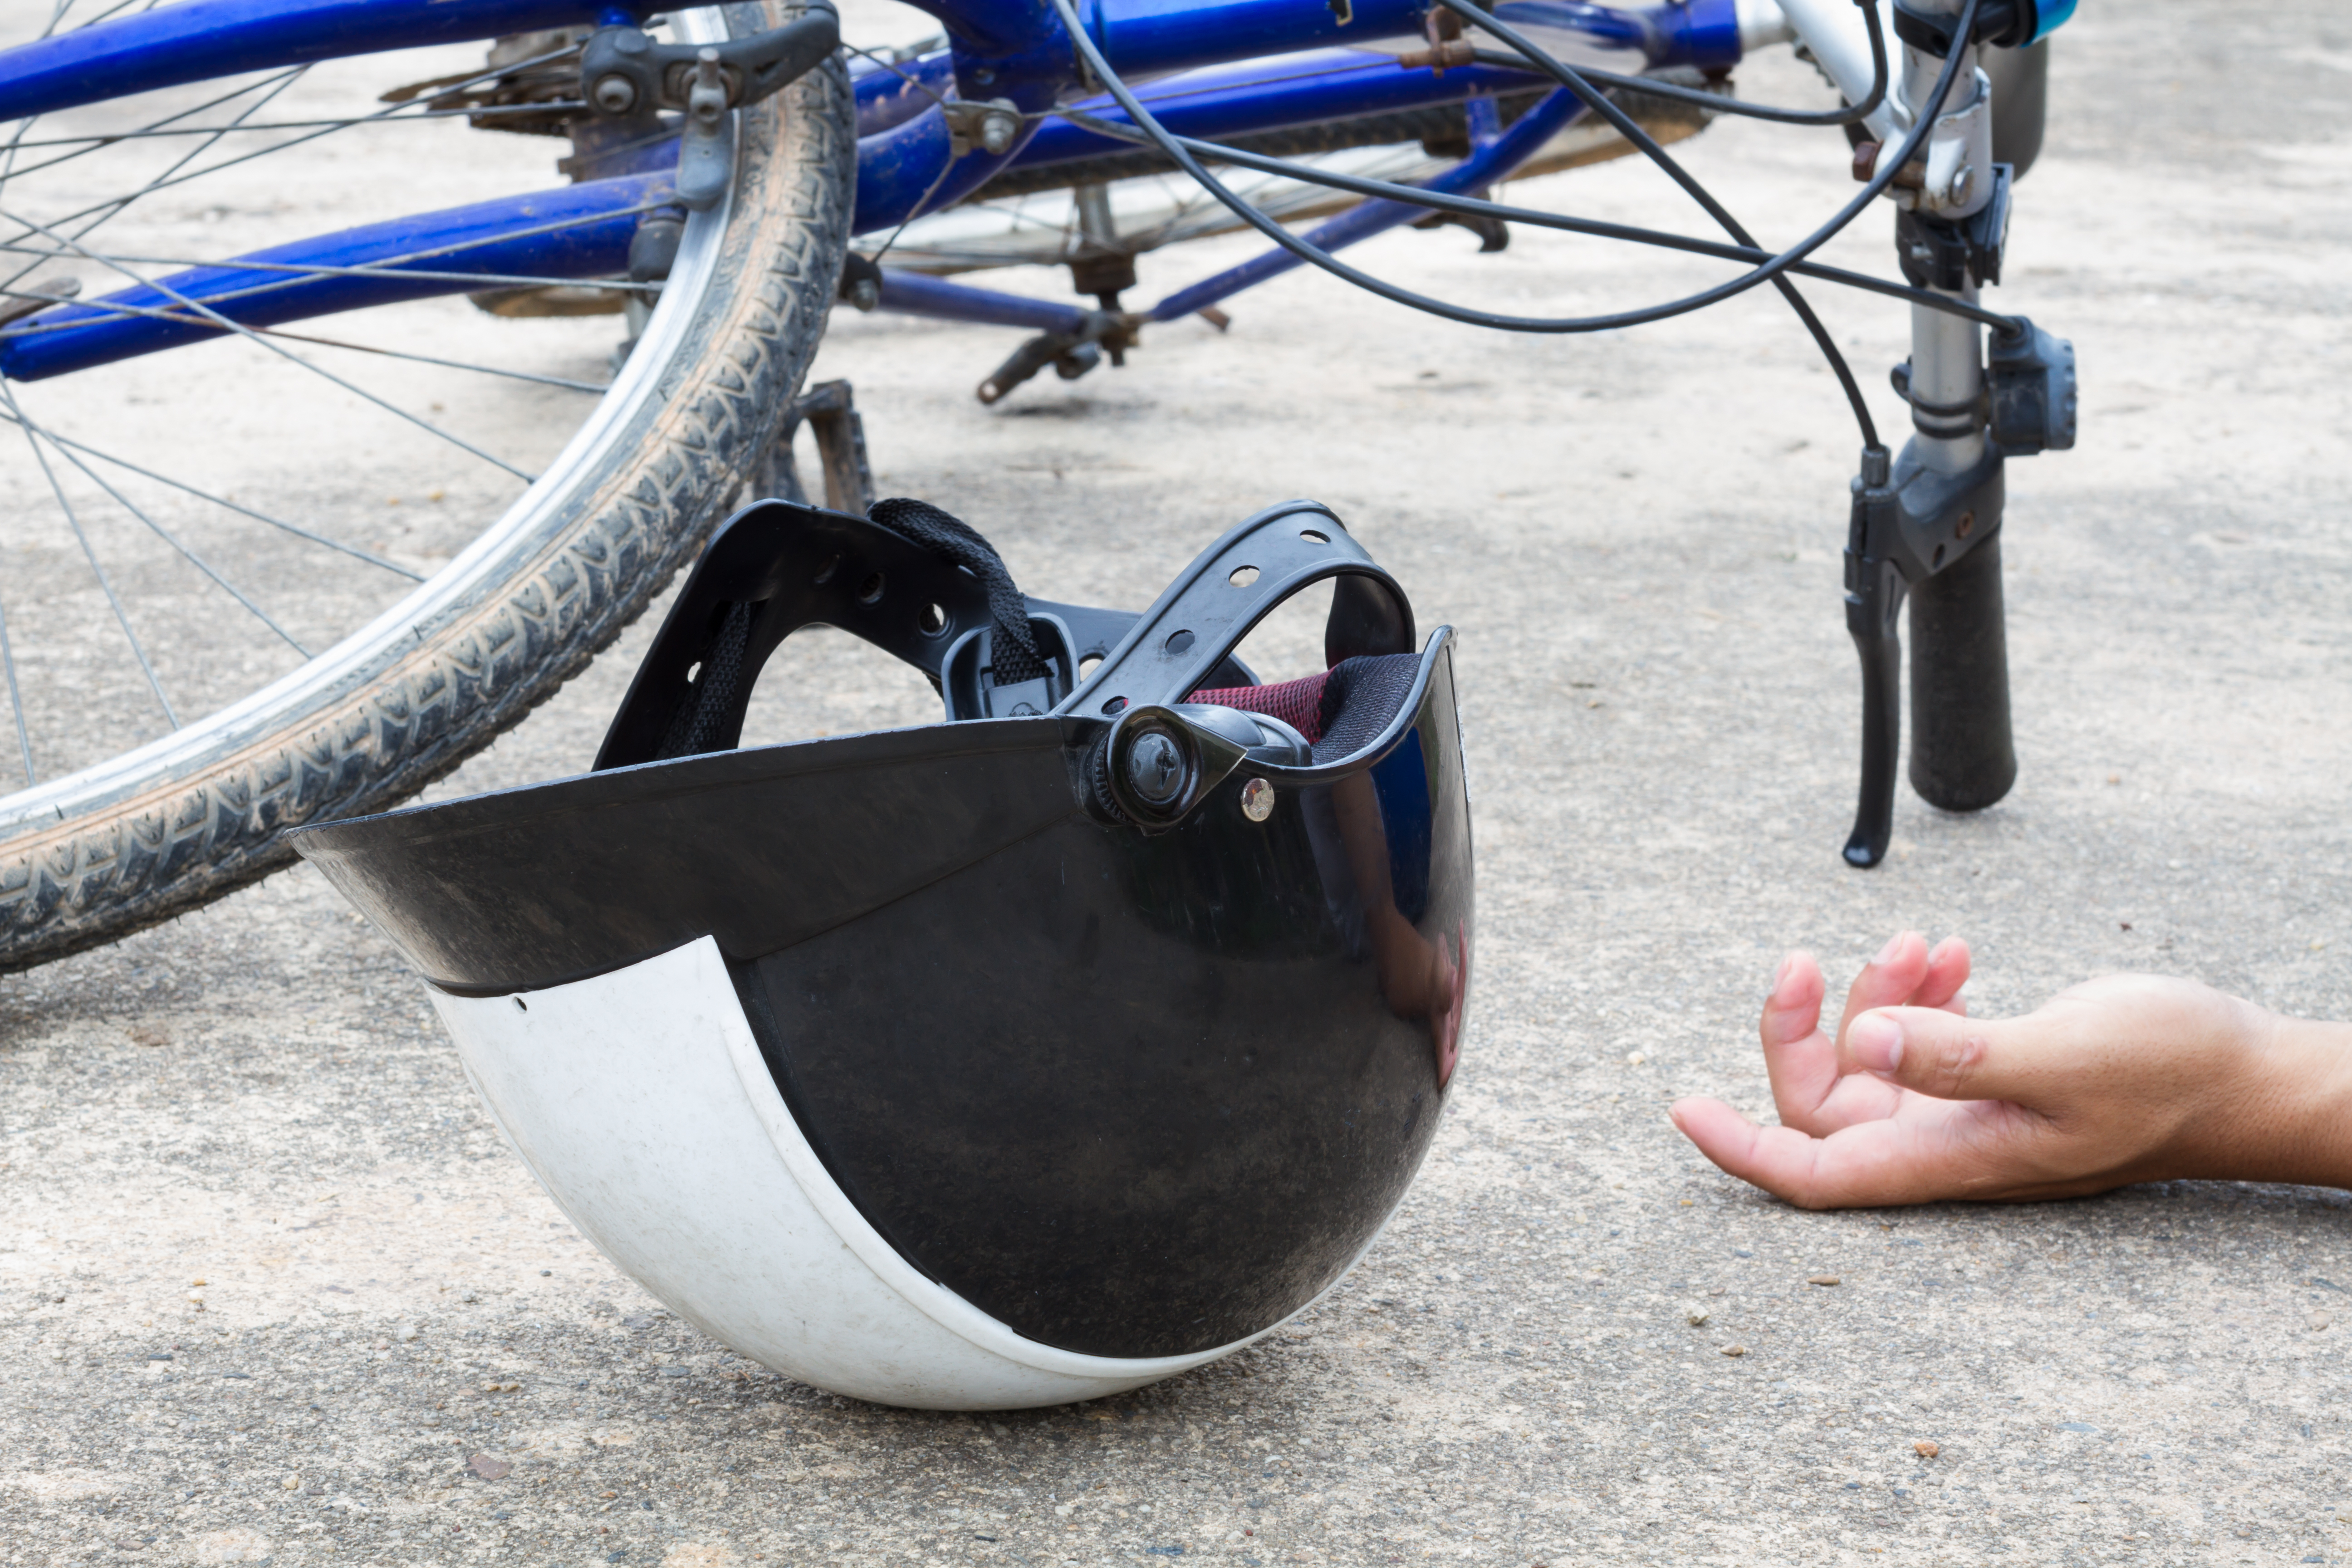 Aplicación móvil alerta sobre accidentes en bicicleta